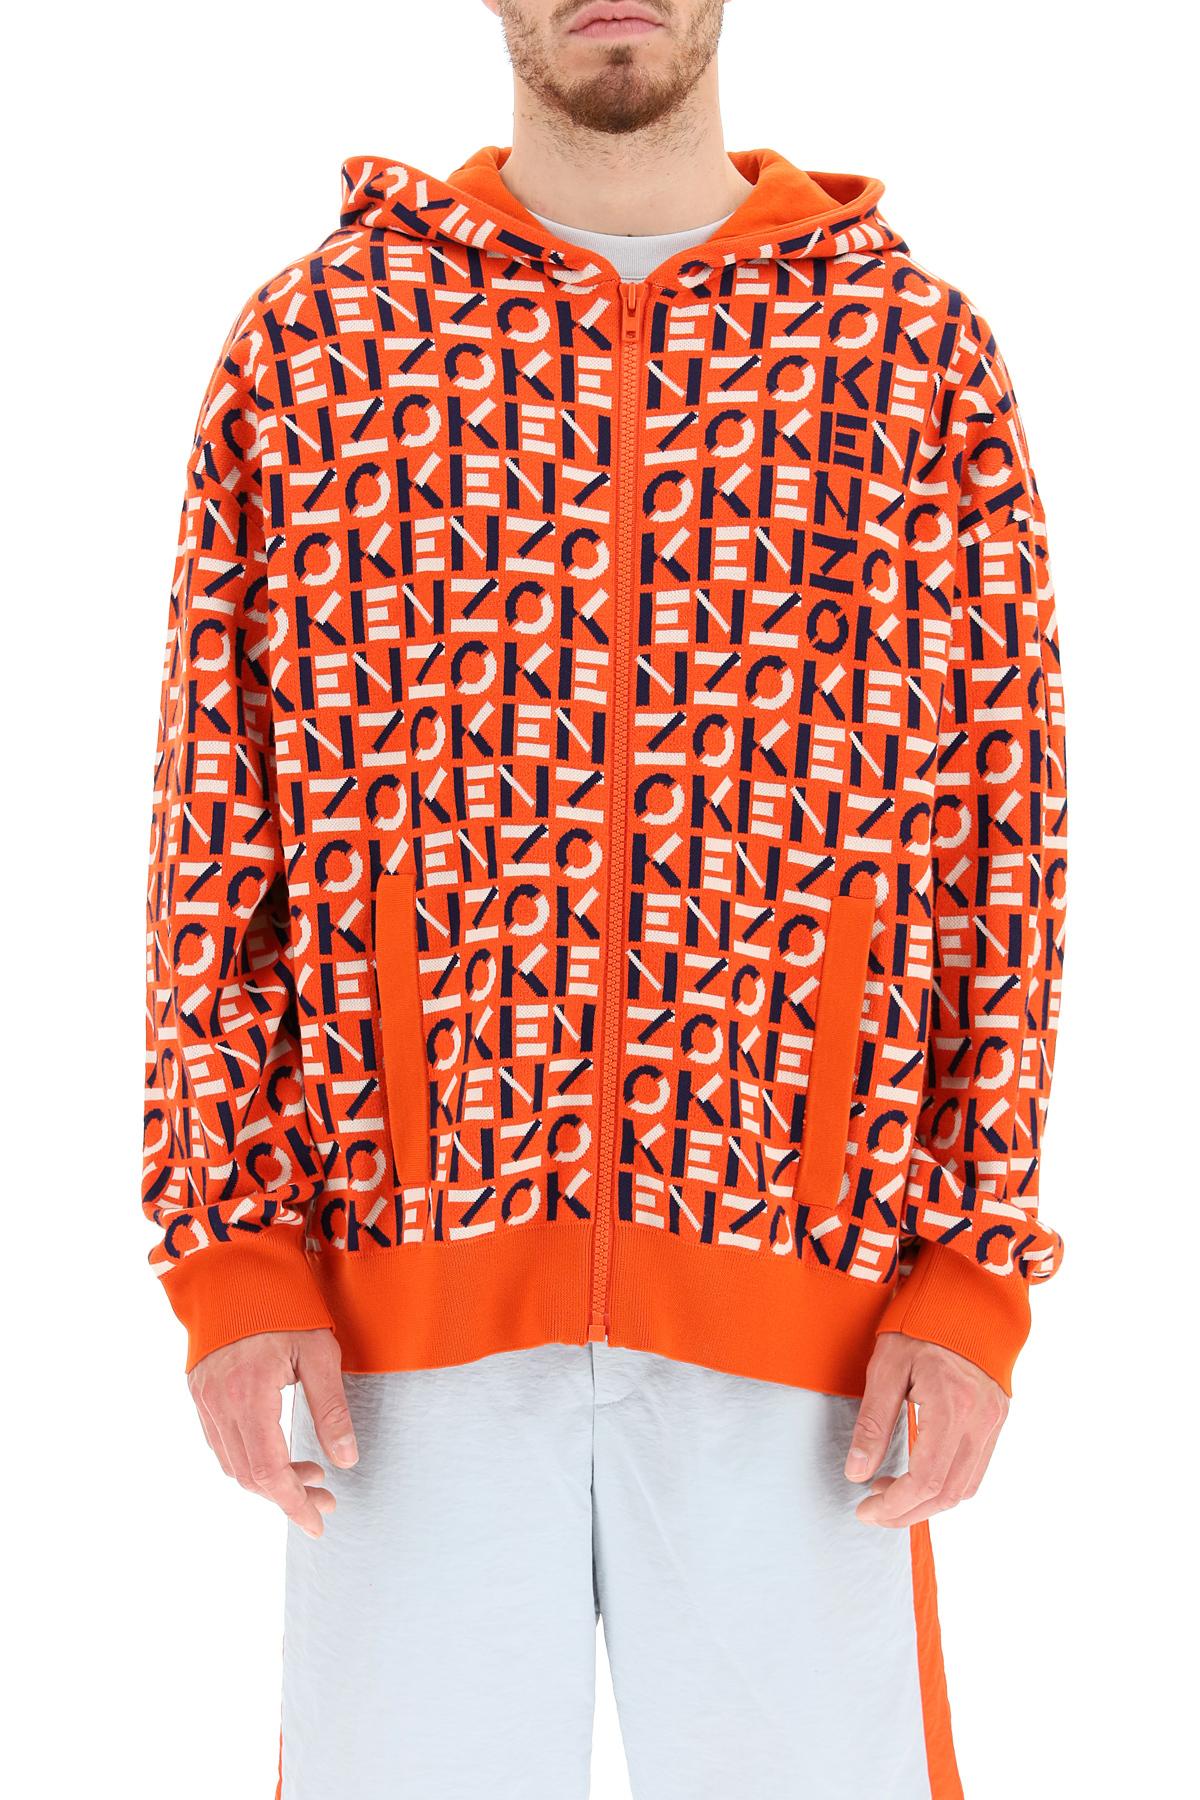 Kenzo giubbino jersey zipped monogram jacquard